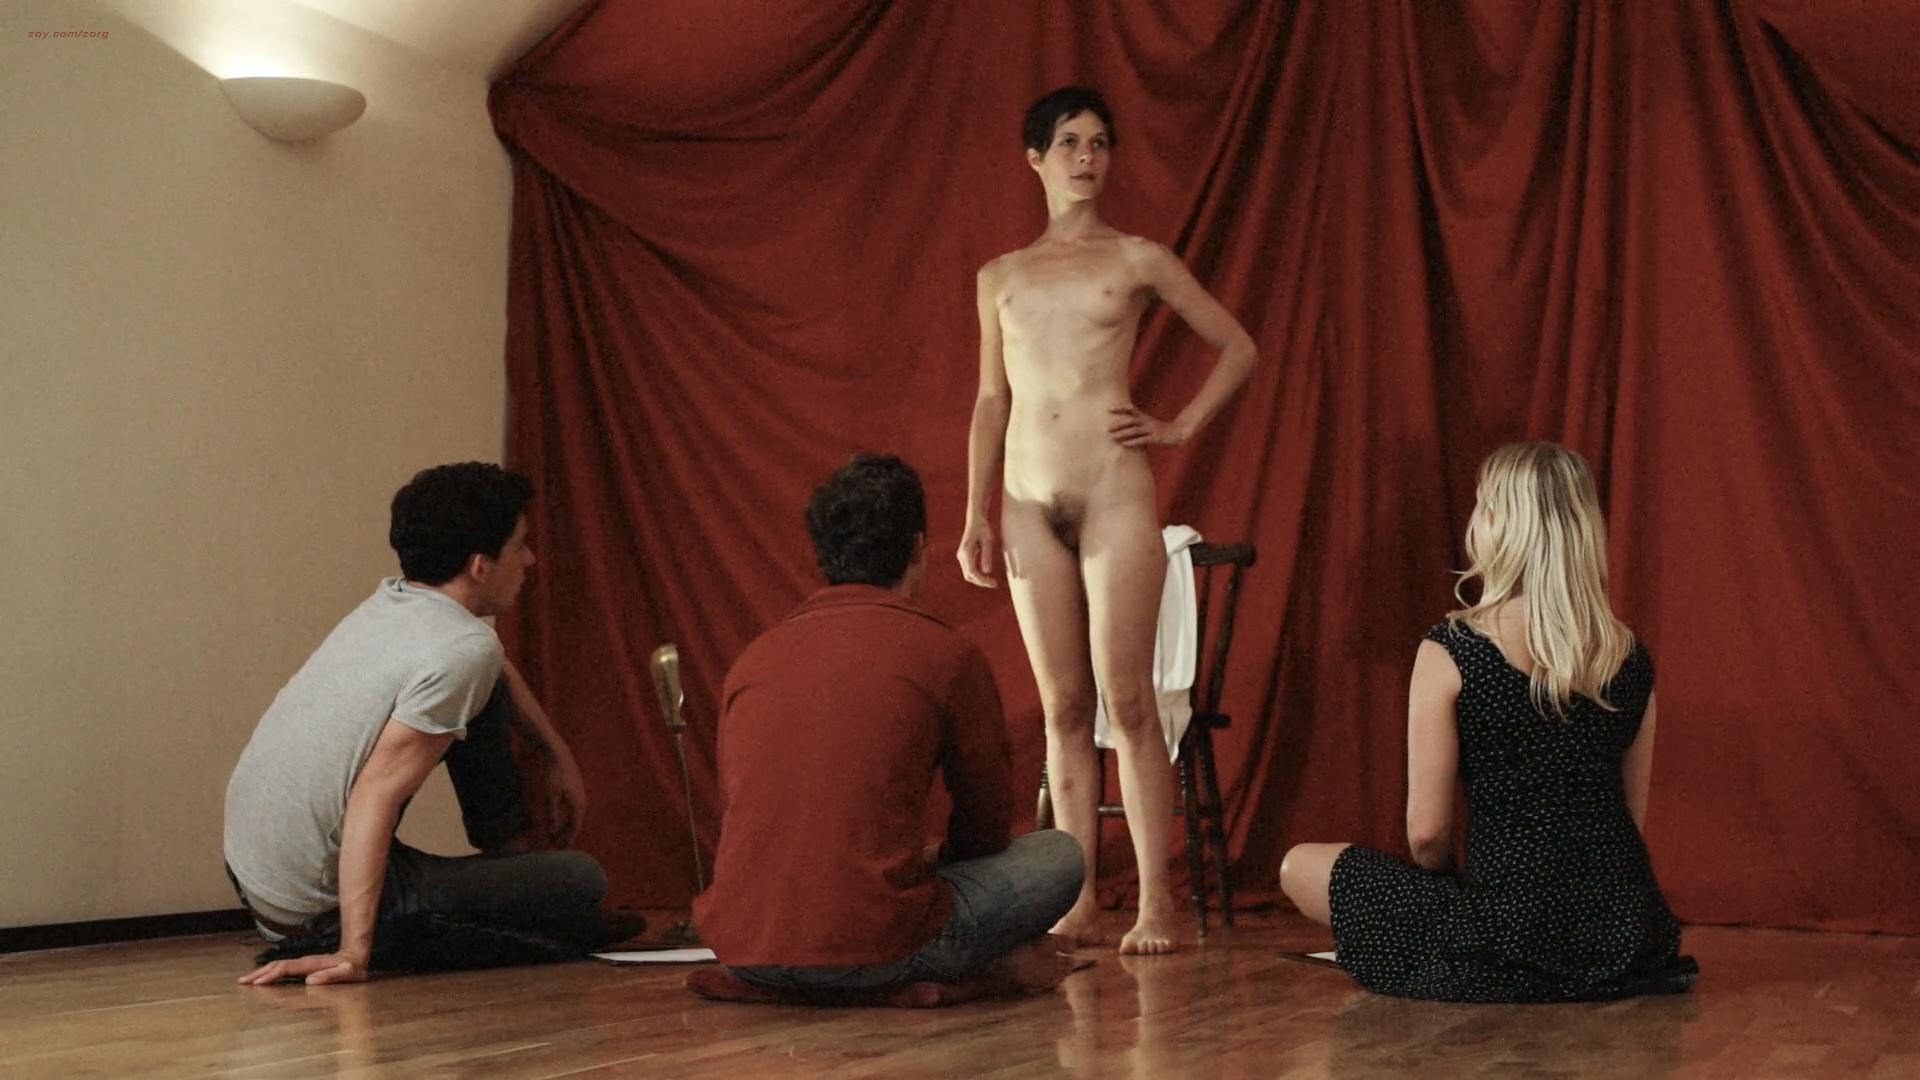 Hannah Arterton nude sex and Rea Mole nude full frontal - Amorous (UK-2014) HD 1080p BluRay (14)